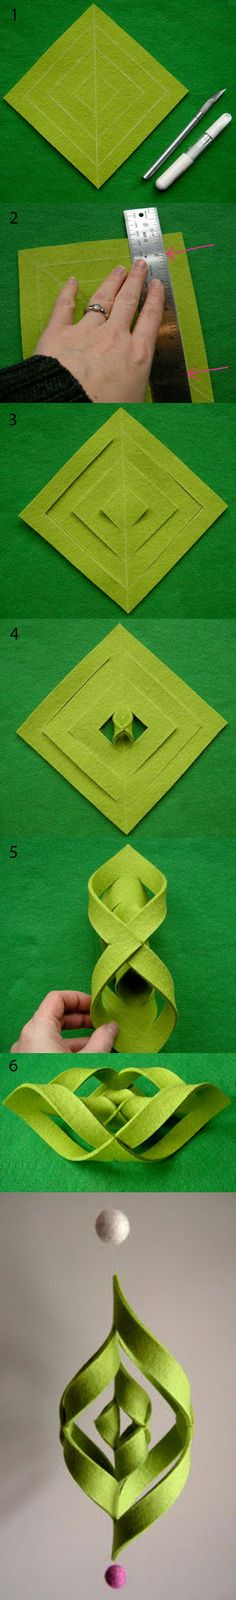 Ornament - Instructions